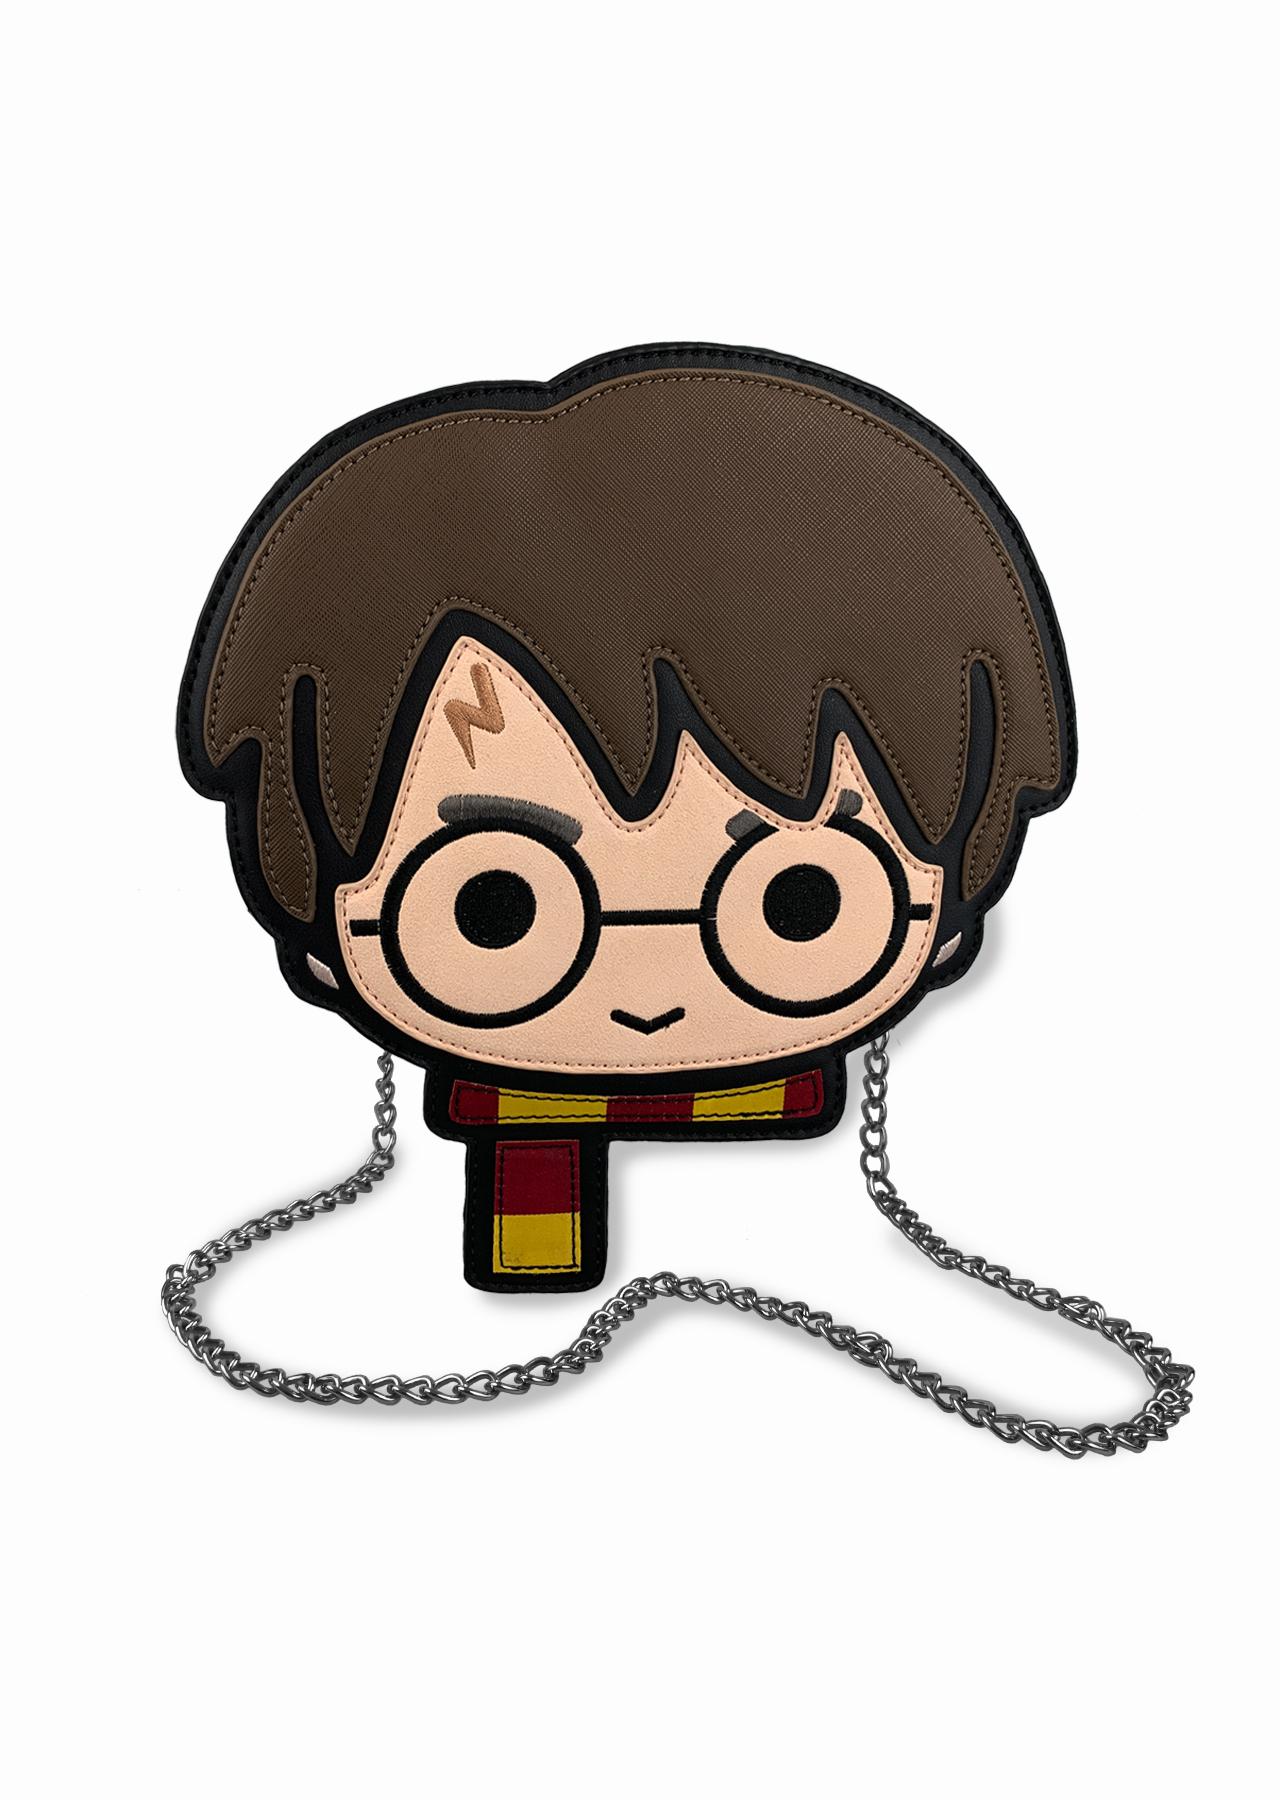 1280x1800 Harry Potter Head Kawaii Style Bag Groovy Uk